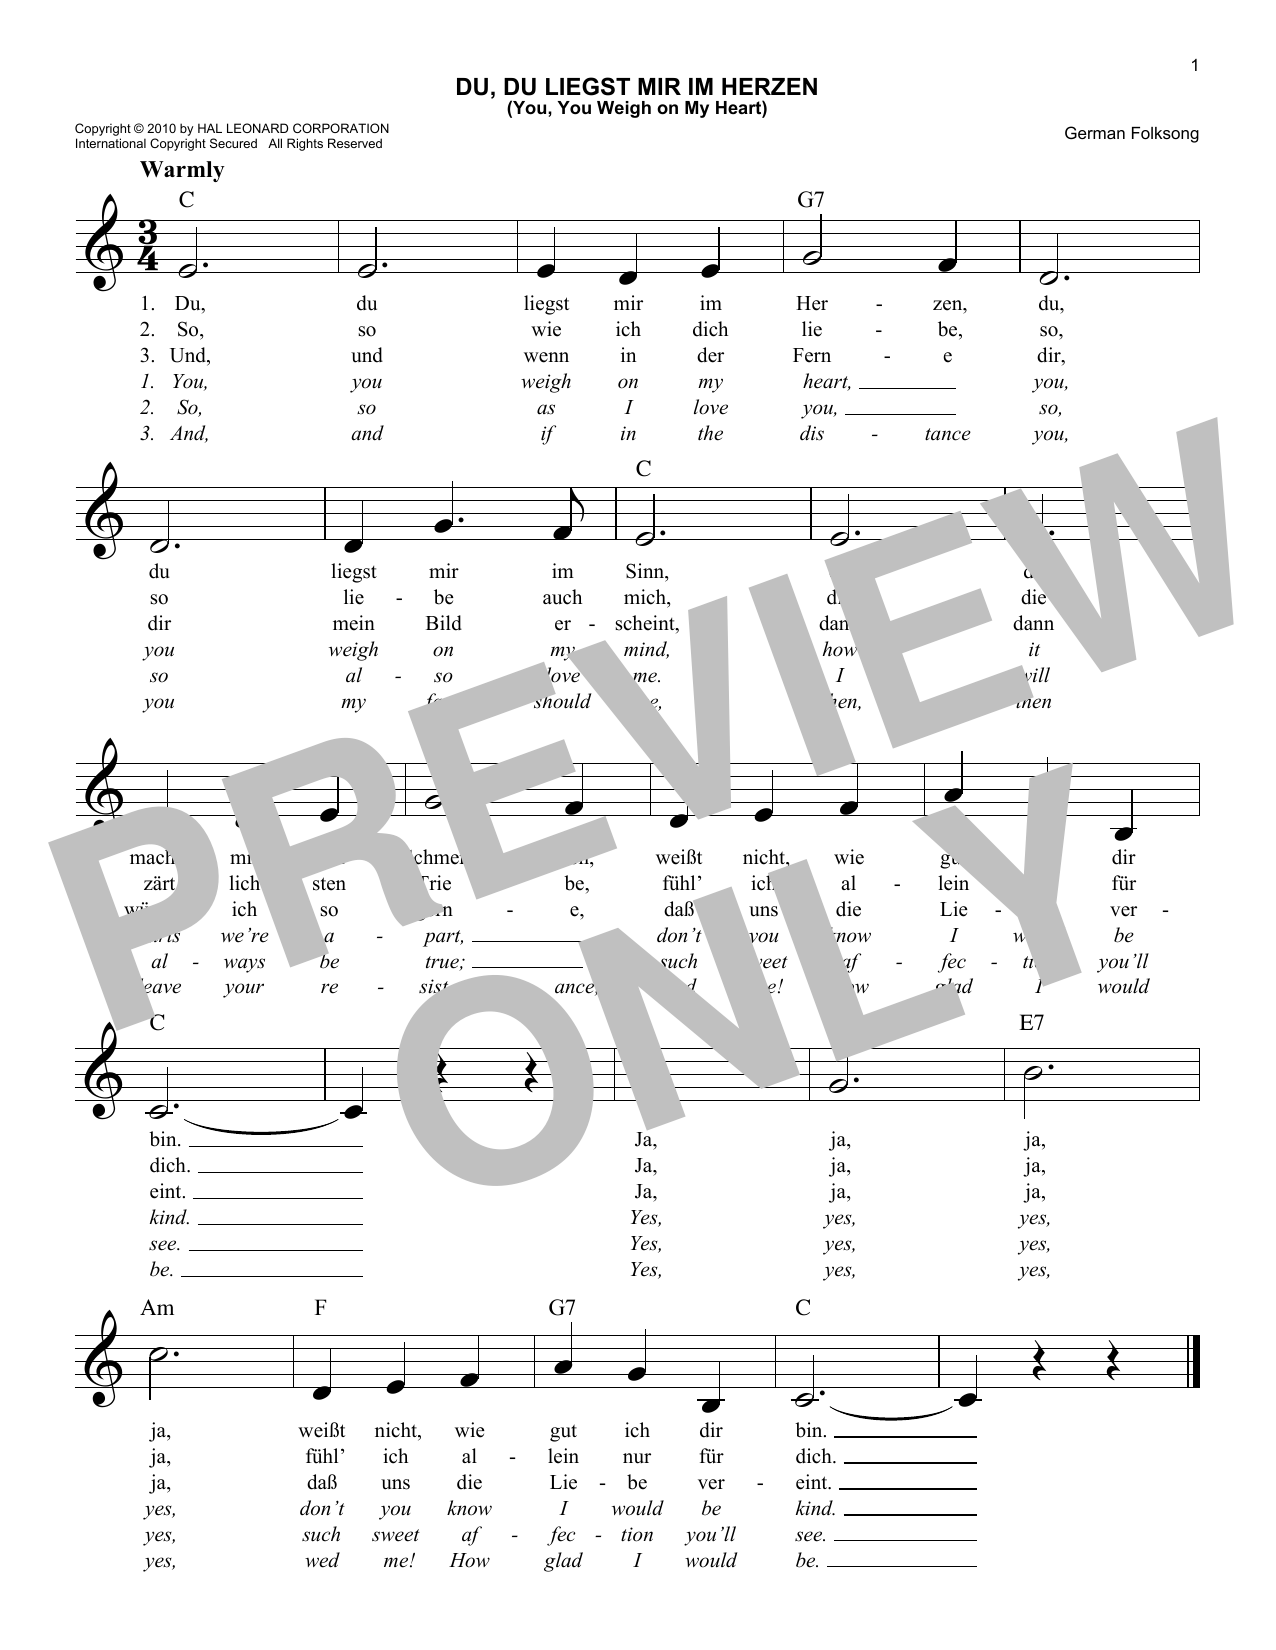 German Folk Song Du, Du Liegst Mir Im Herzen (You, You Weigh On My Heart) sheet music notes and chords. Download Printable PDF.